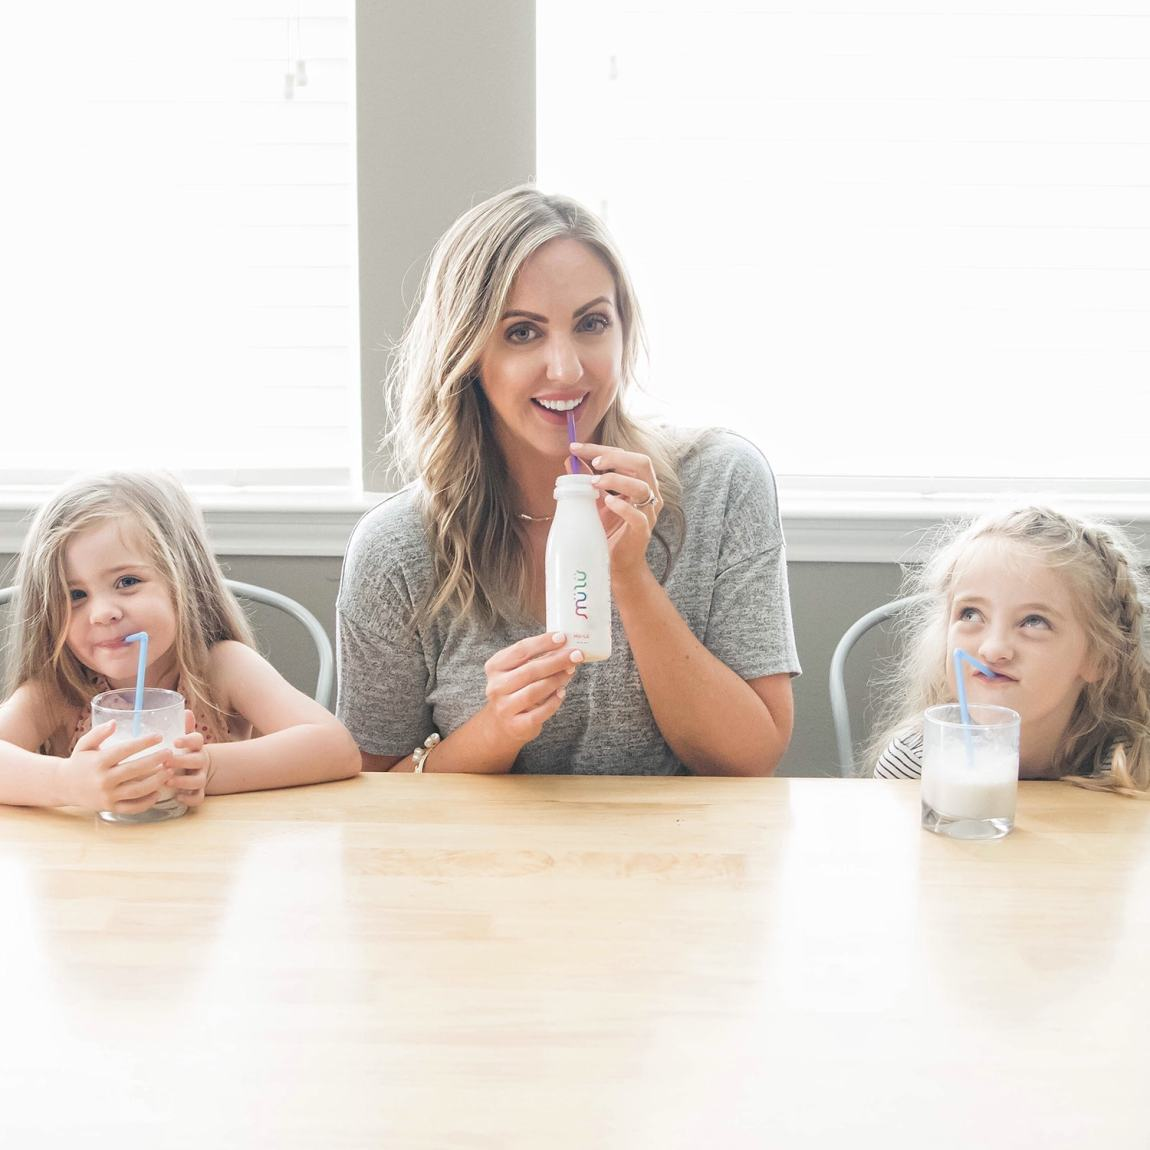 Raise a glass on World Milk Day